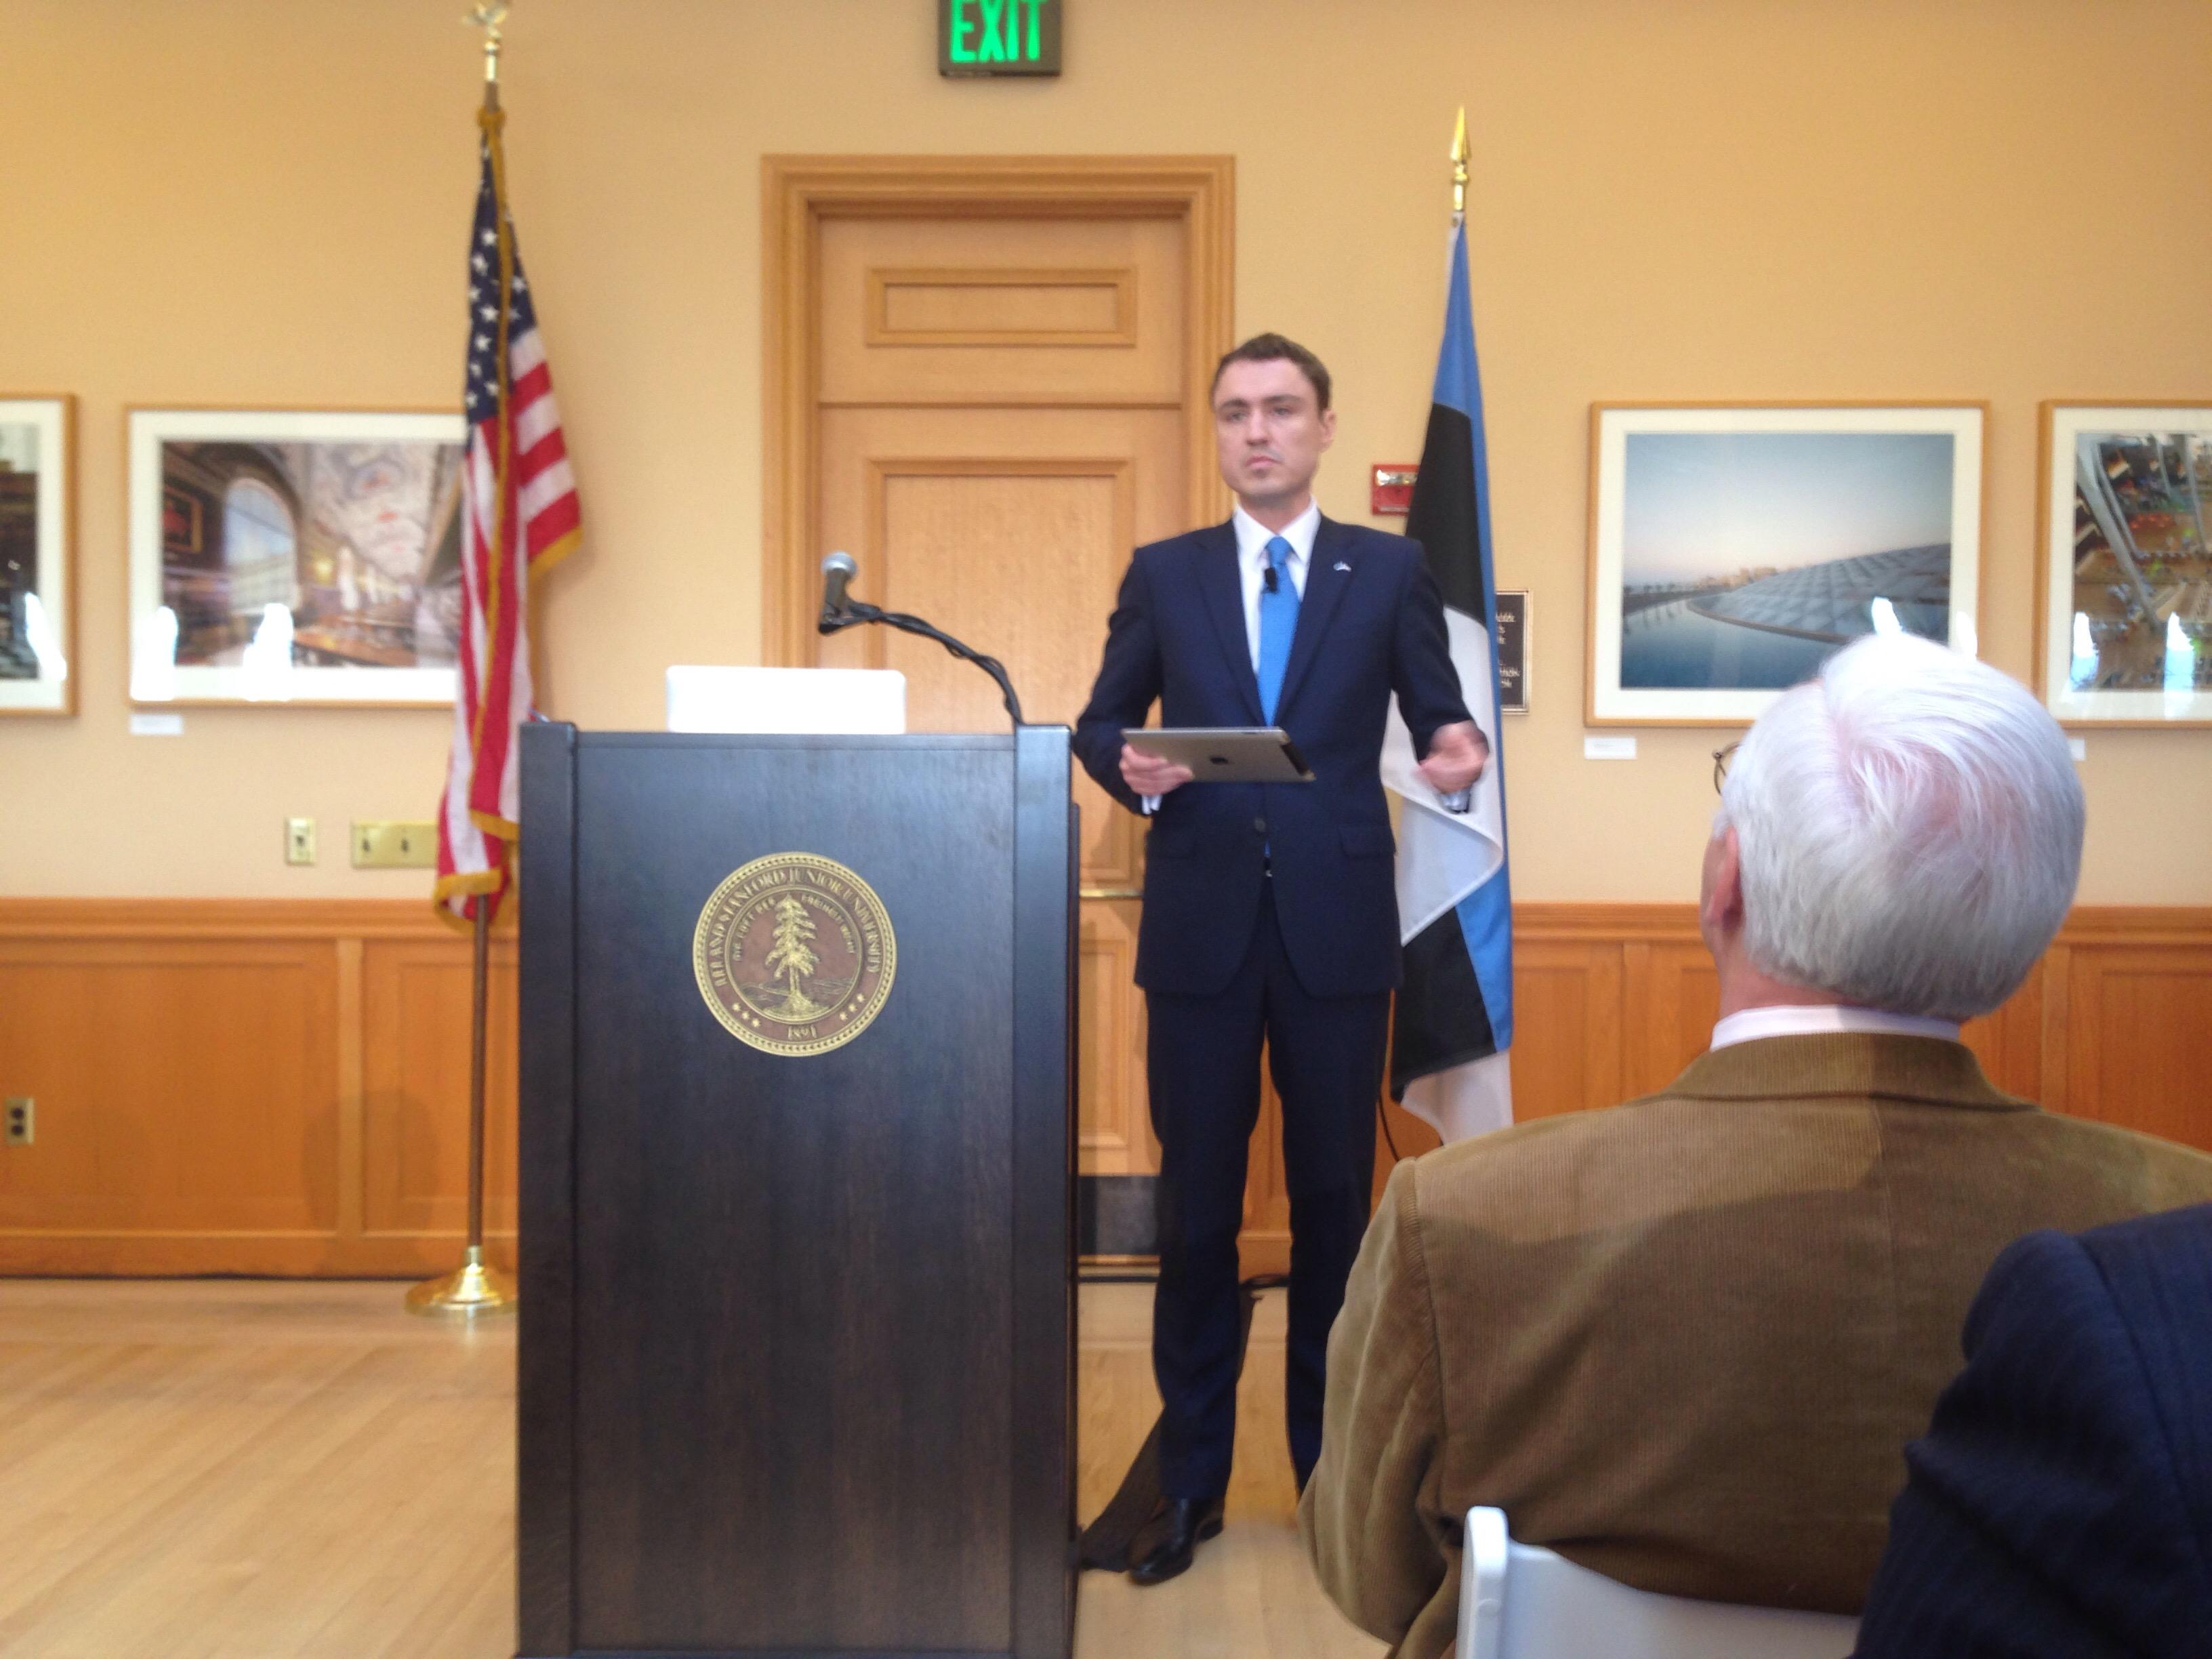 Estonian Prime Minister Taavi Rõivas spoke at Stanford University on Monday.